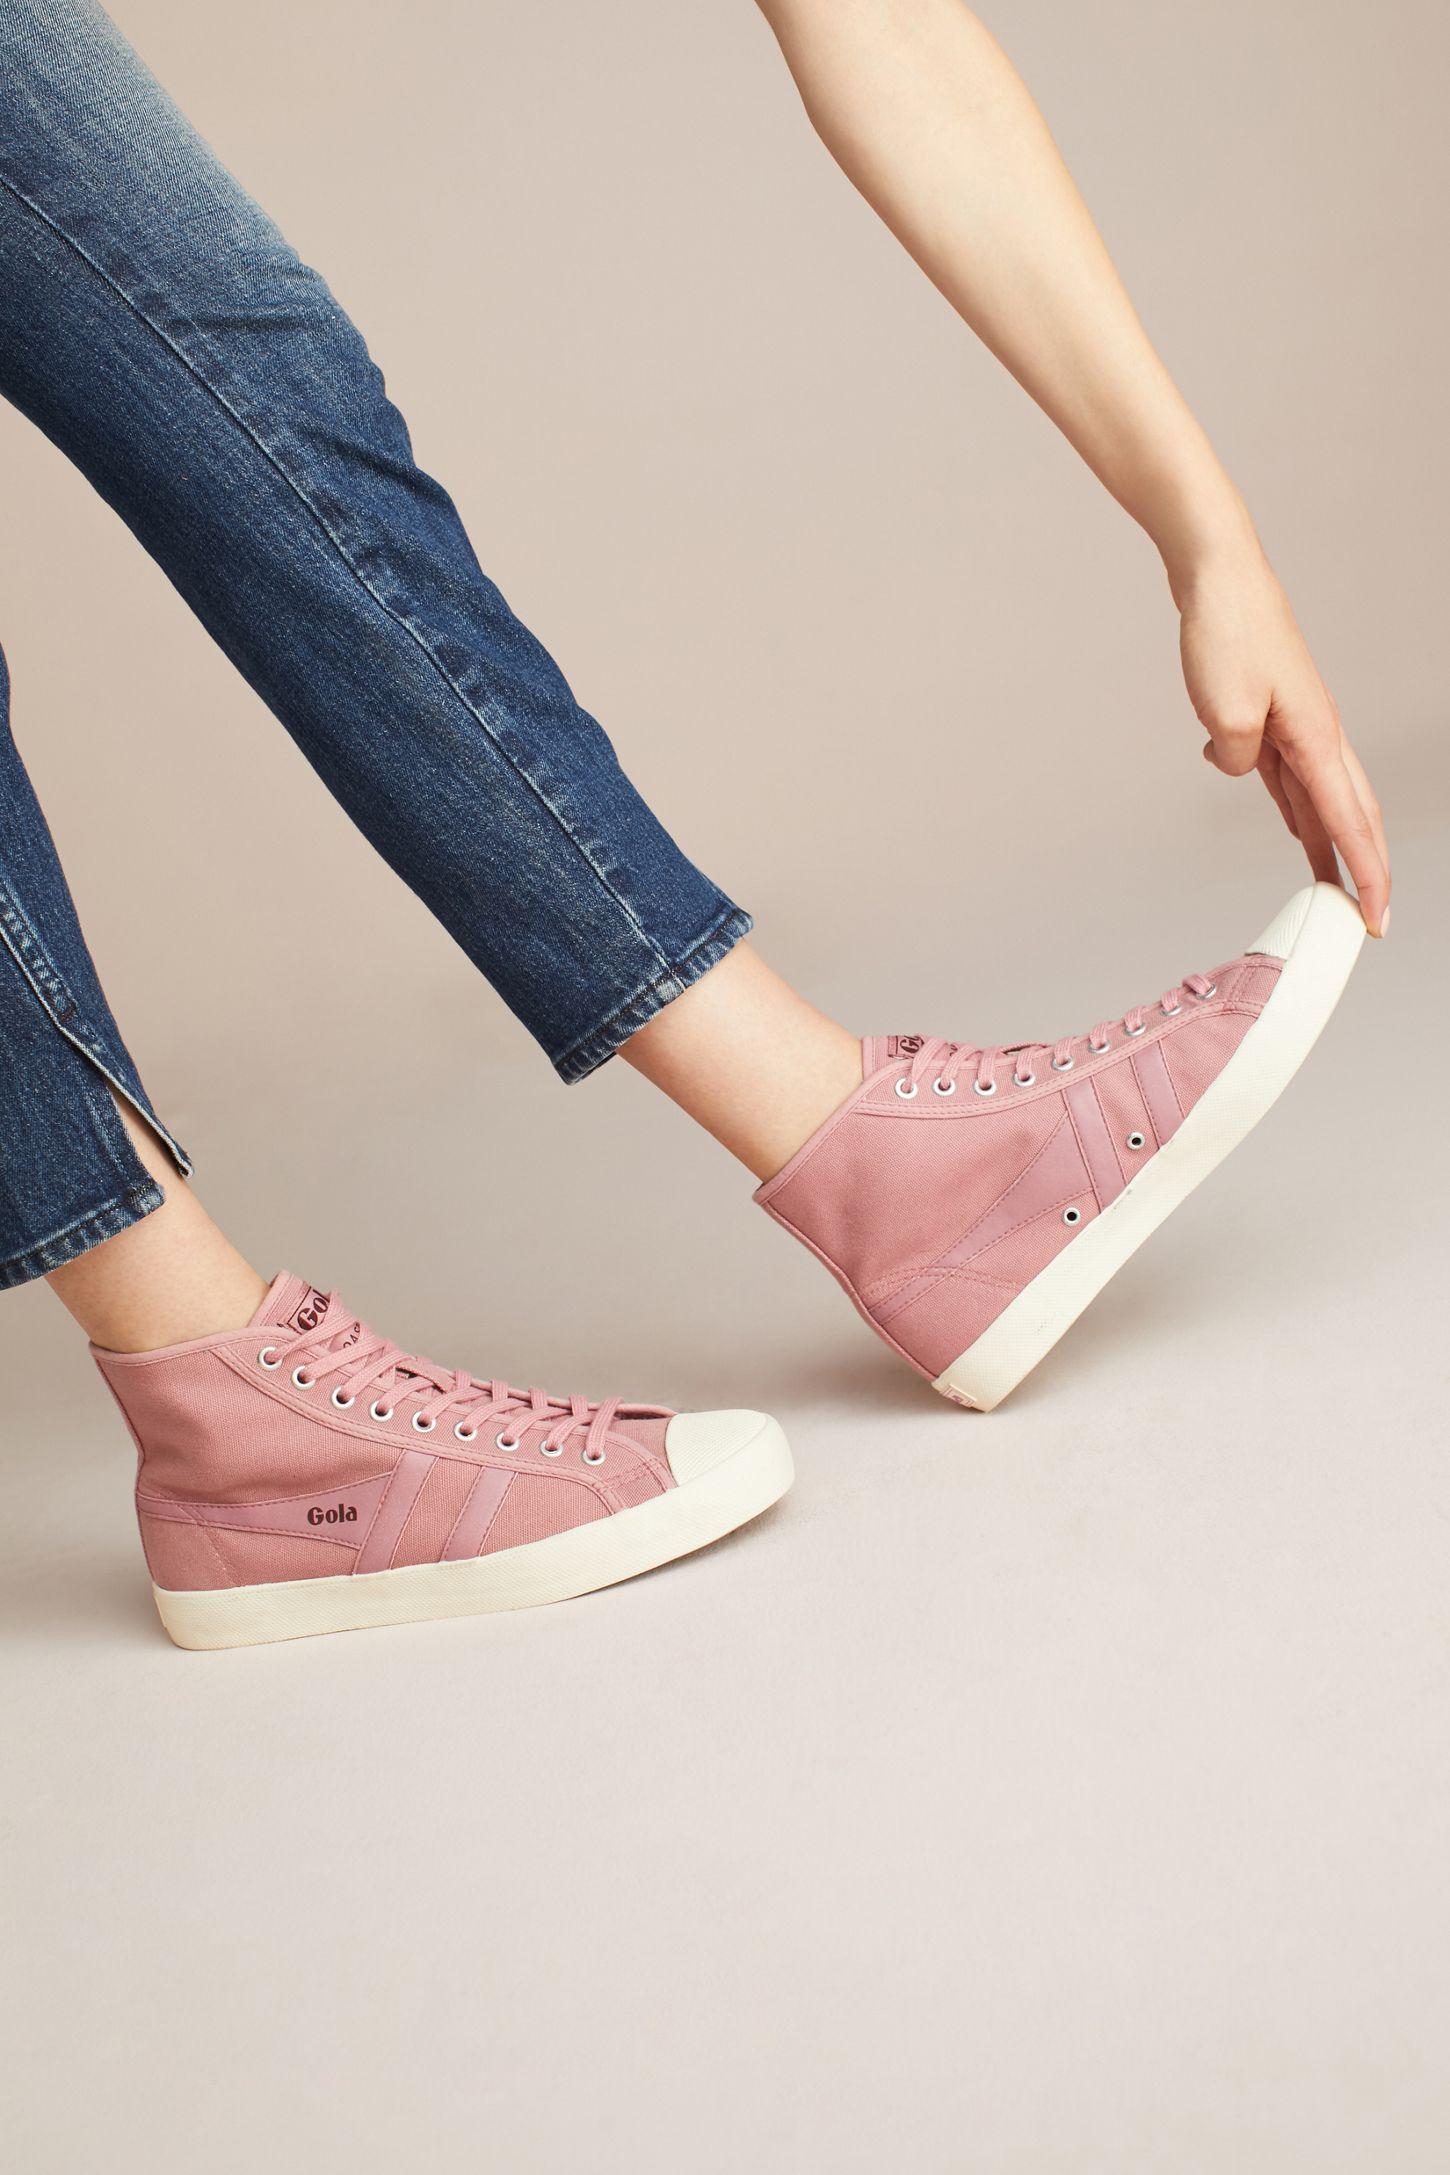 d75dc6d227e Gola Coaster High-Top Sneakers